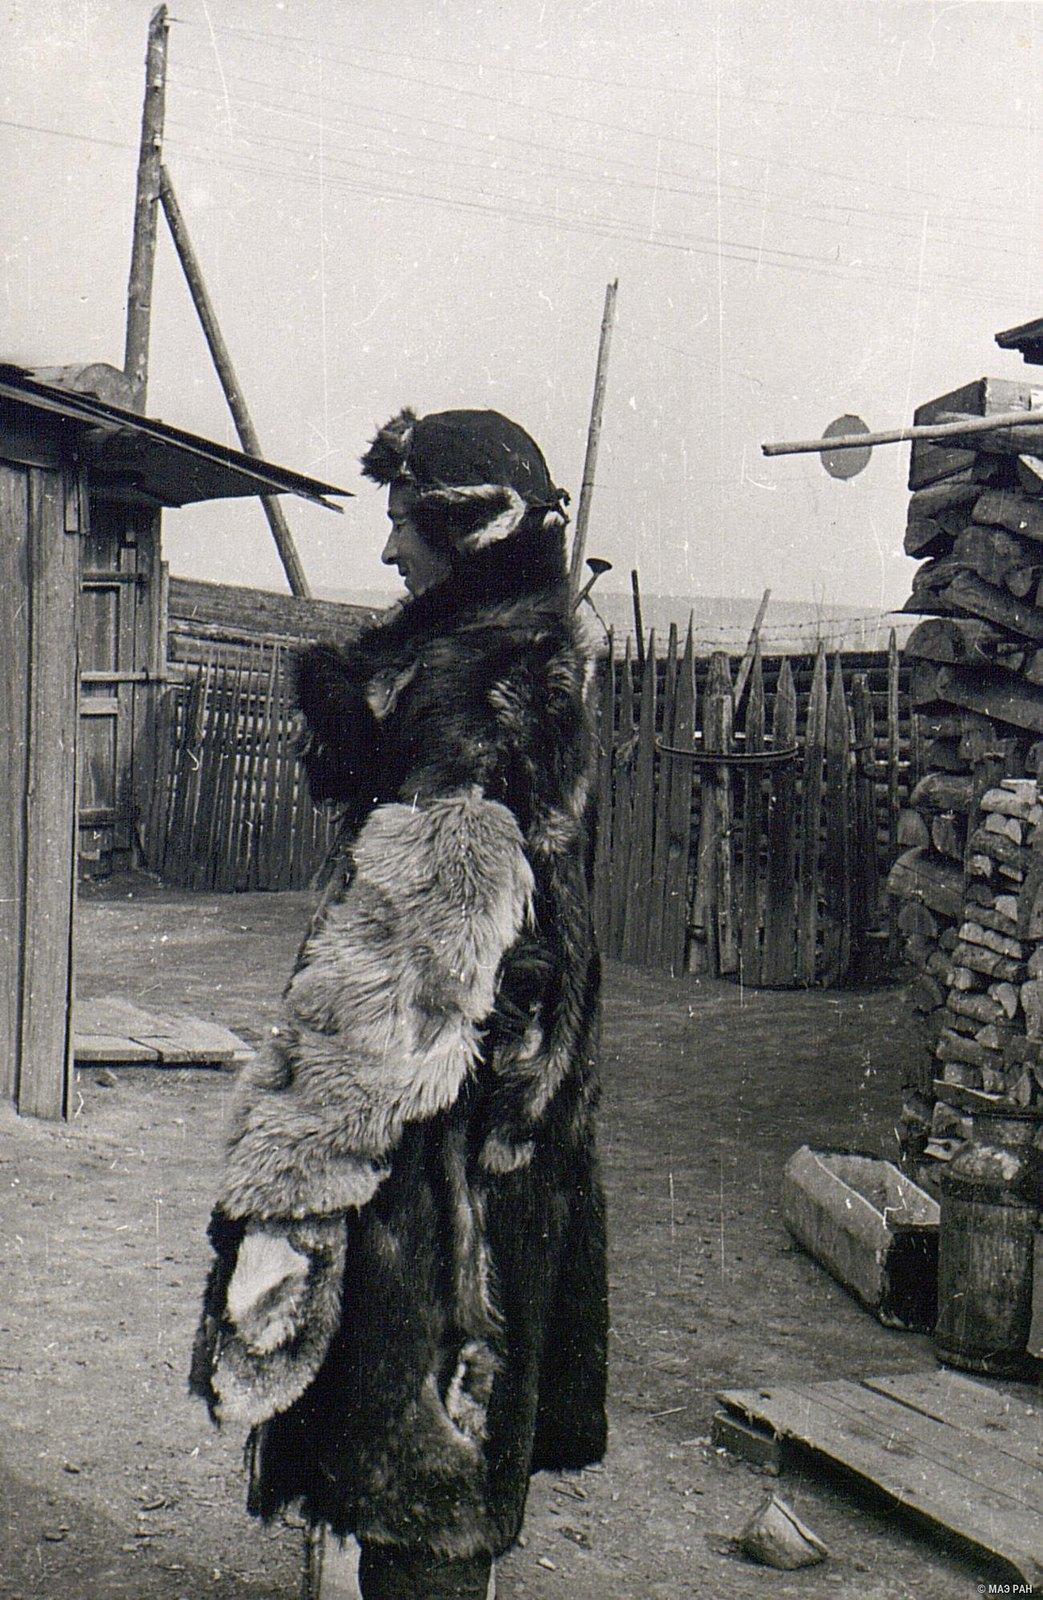 Мужчина в зимнем костюме (вид сбоку)